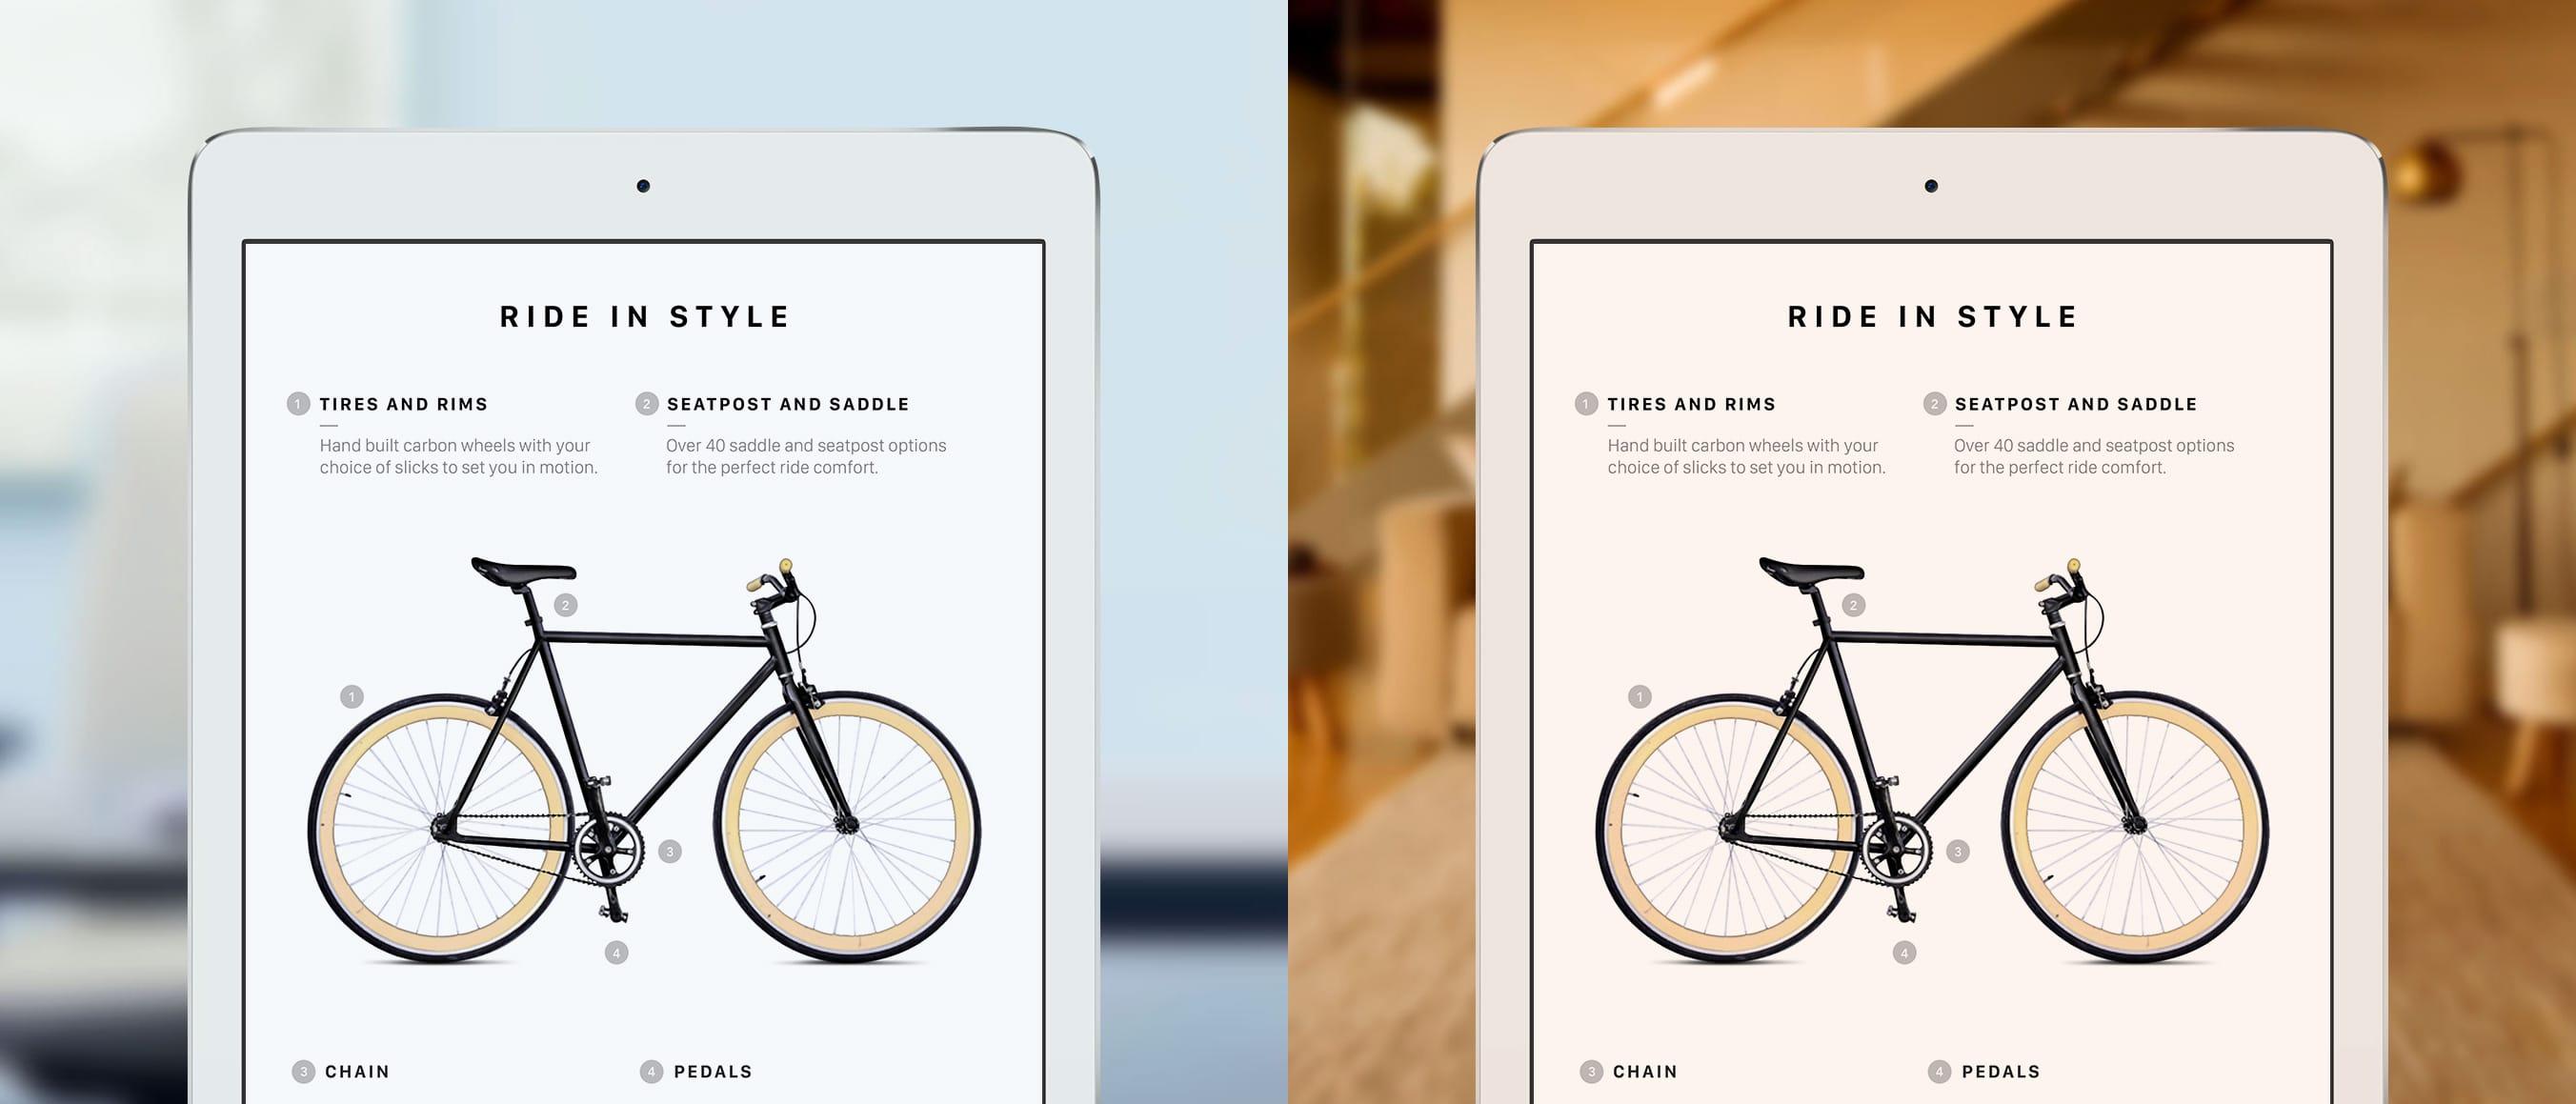 iPad-Pro-9.7-True-Tone-Display-comparison